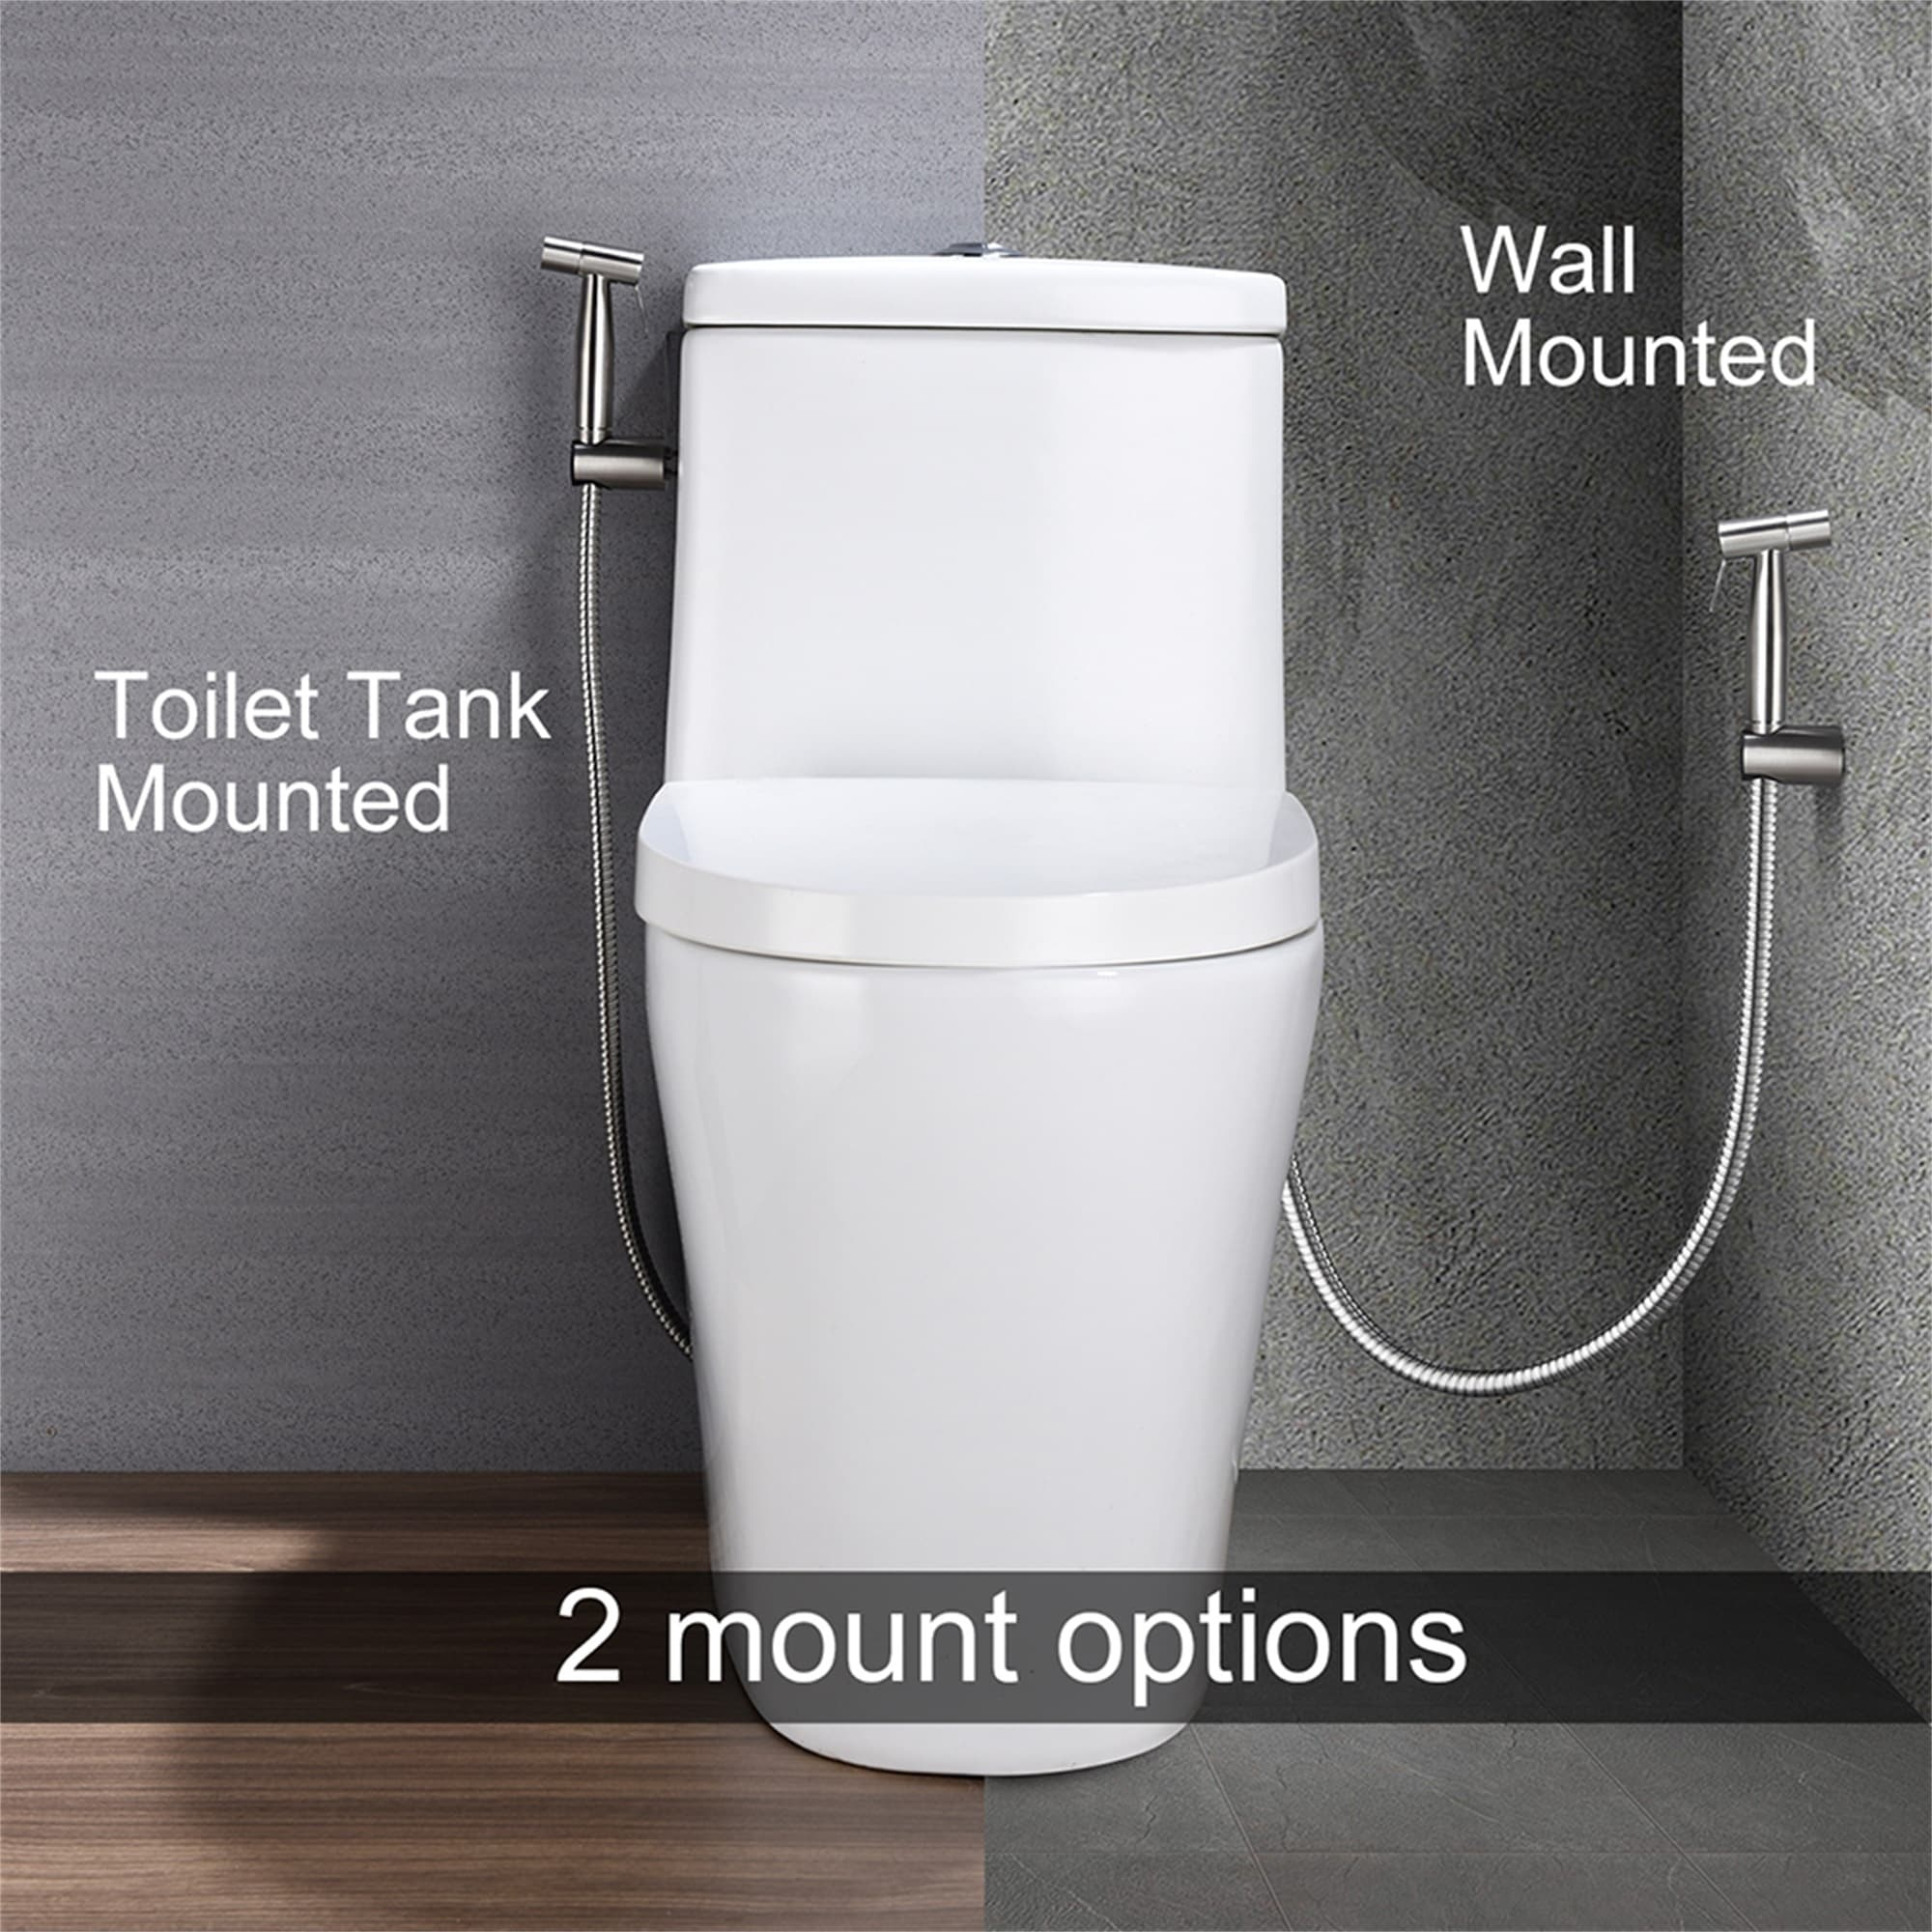 Antique Brass Handheld Bidet Toilet Sprayer Wall Mount Shower Bidet Diaper Spray Shattaf for Personal Hygiene